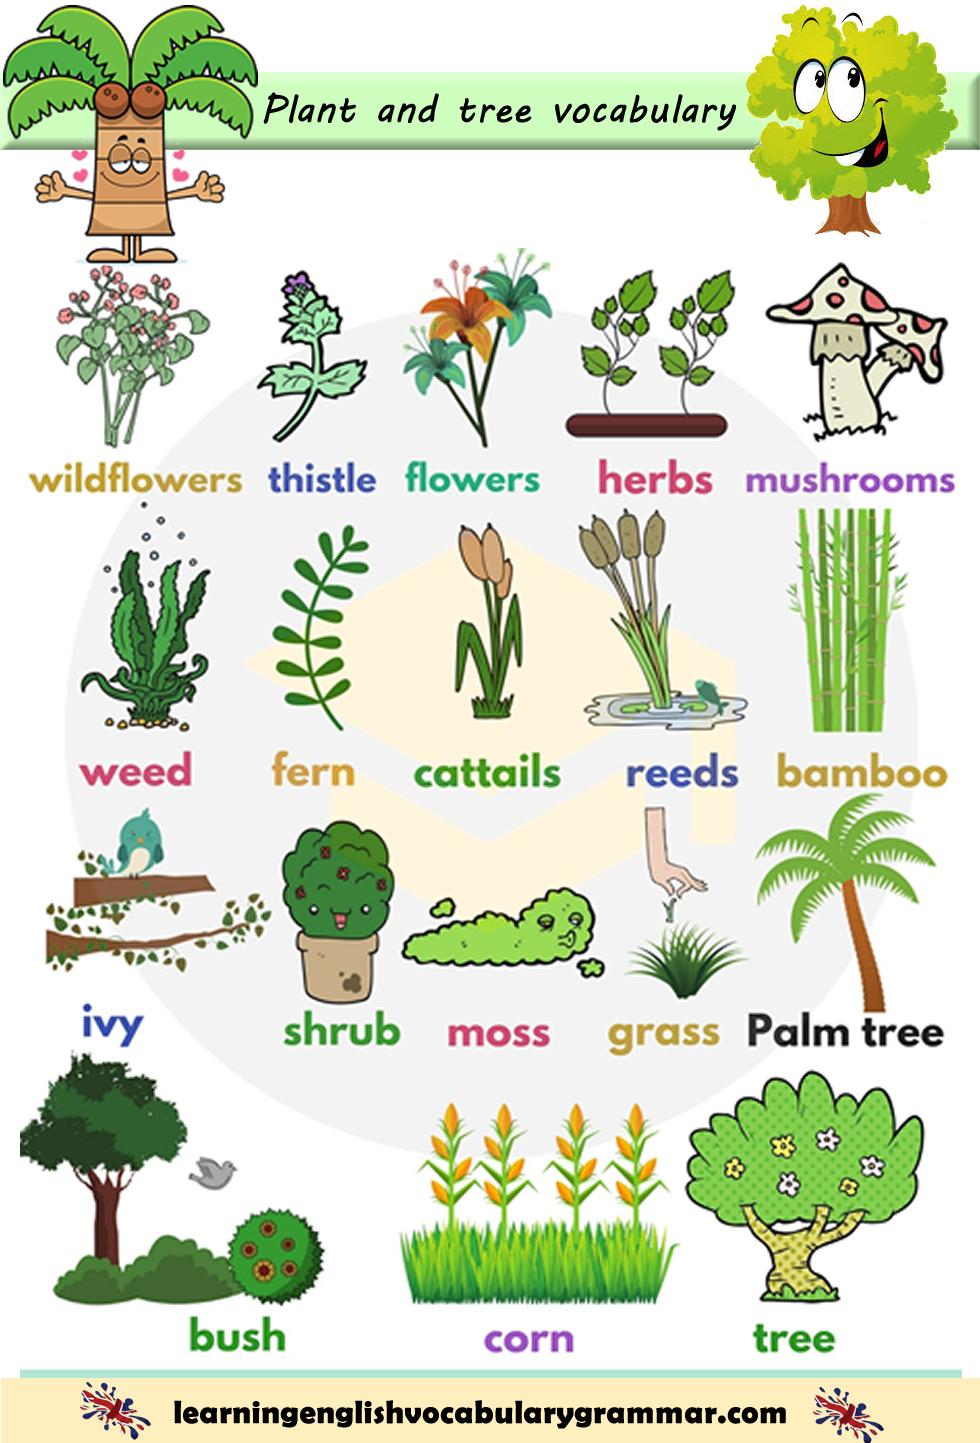 Trees Plants And Flowers Vocabulary List With Pictures Como Aprender Ingles Basico Vocabulario En Ingles Material Escolar En Ingles